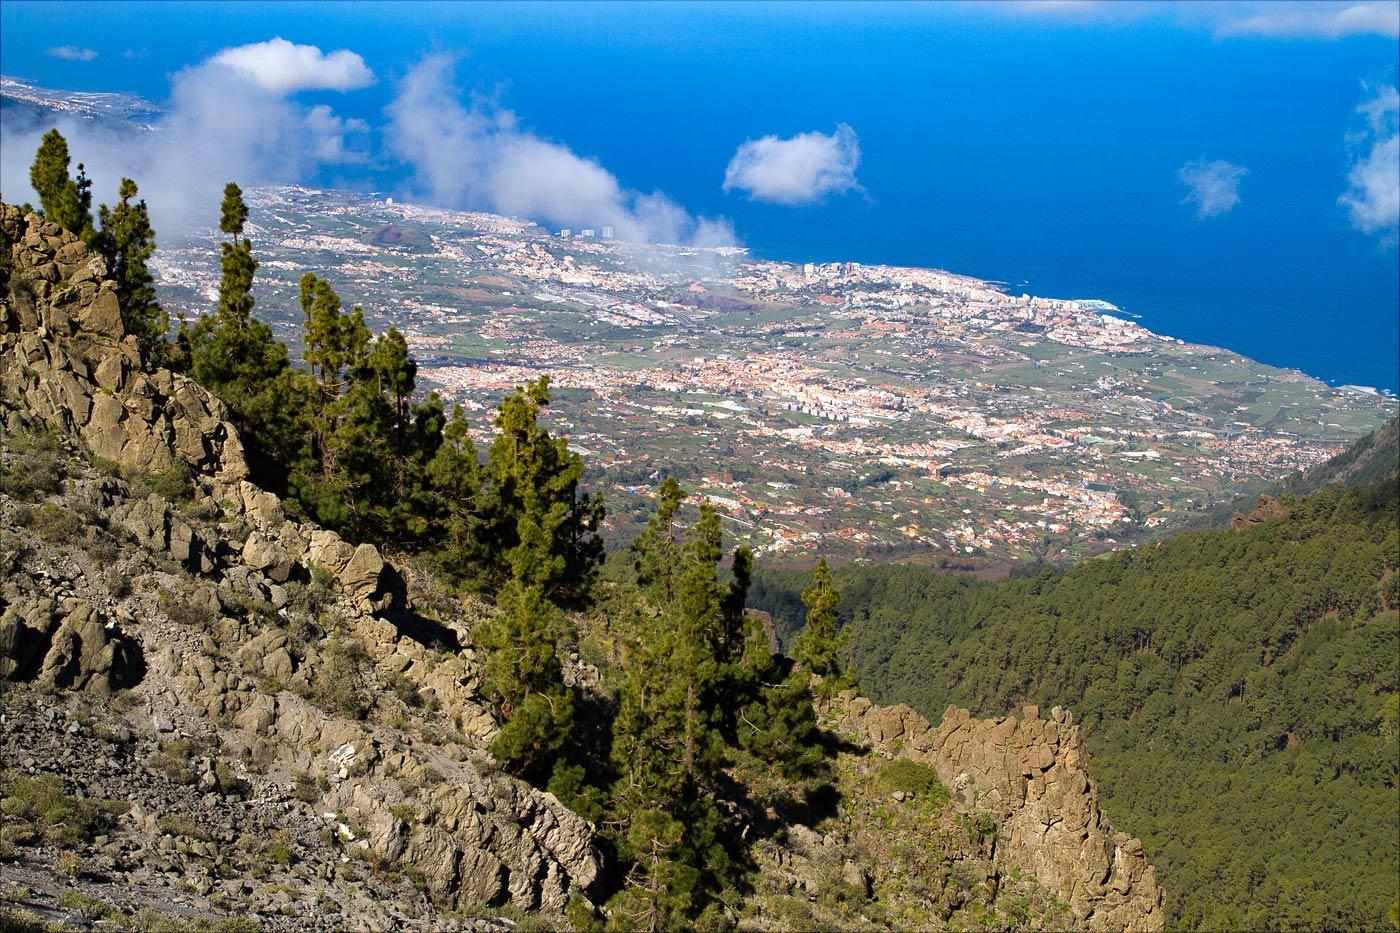 Вид на северо-востояное побережье острова Тенерифе